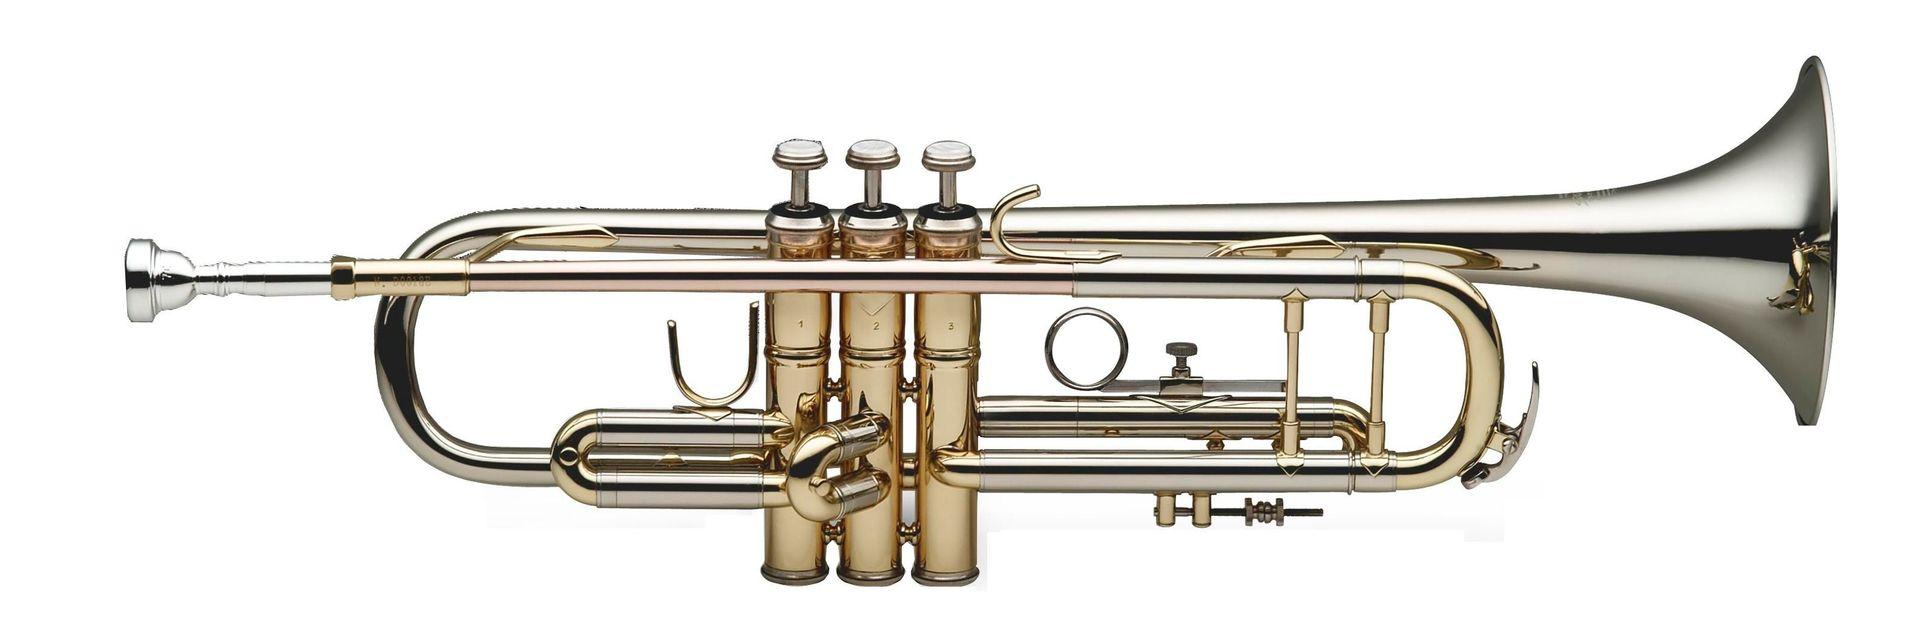 SWING TR-202-NS B-Trompete  Neusilber Schallbecher lackiert, Bohrung 11,66mm